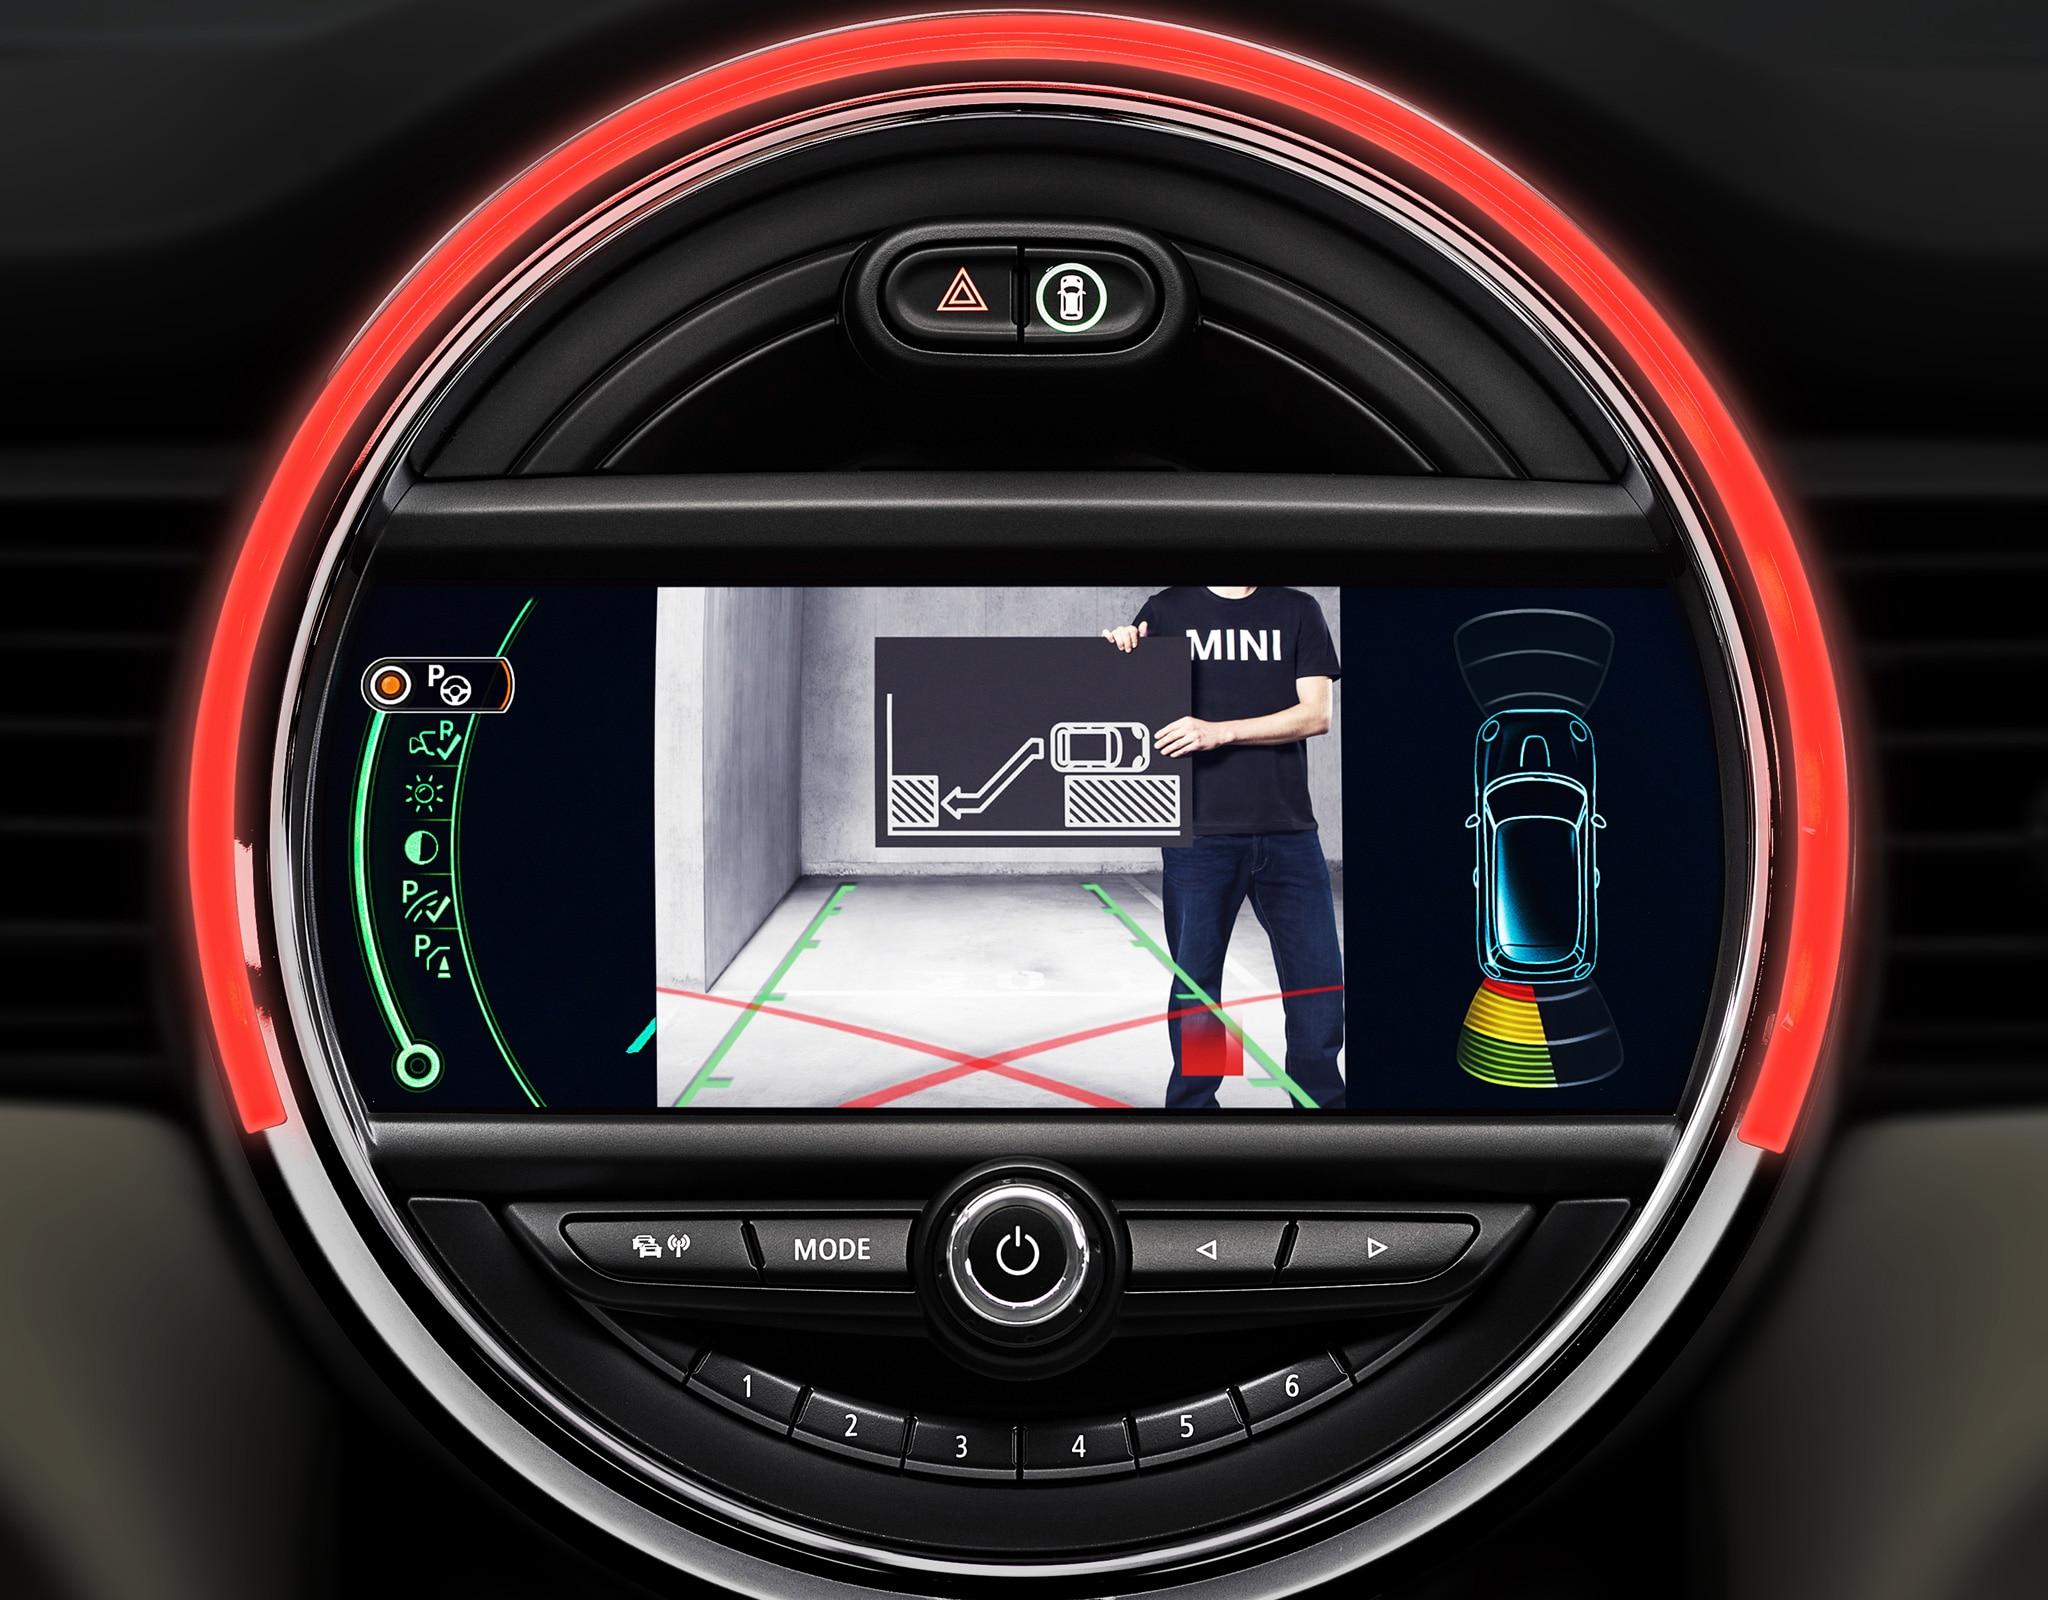 2015 Mini Cooper Driver Assistance Screen1